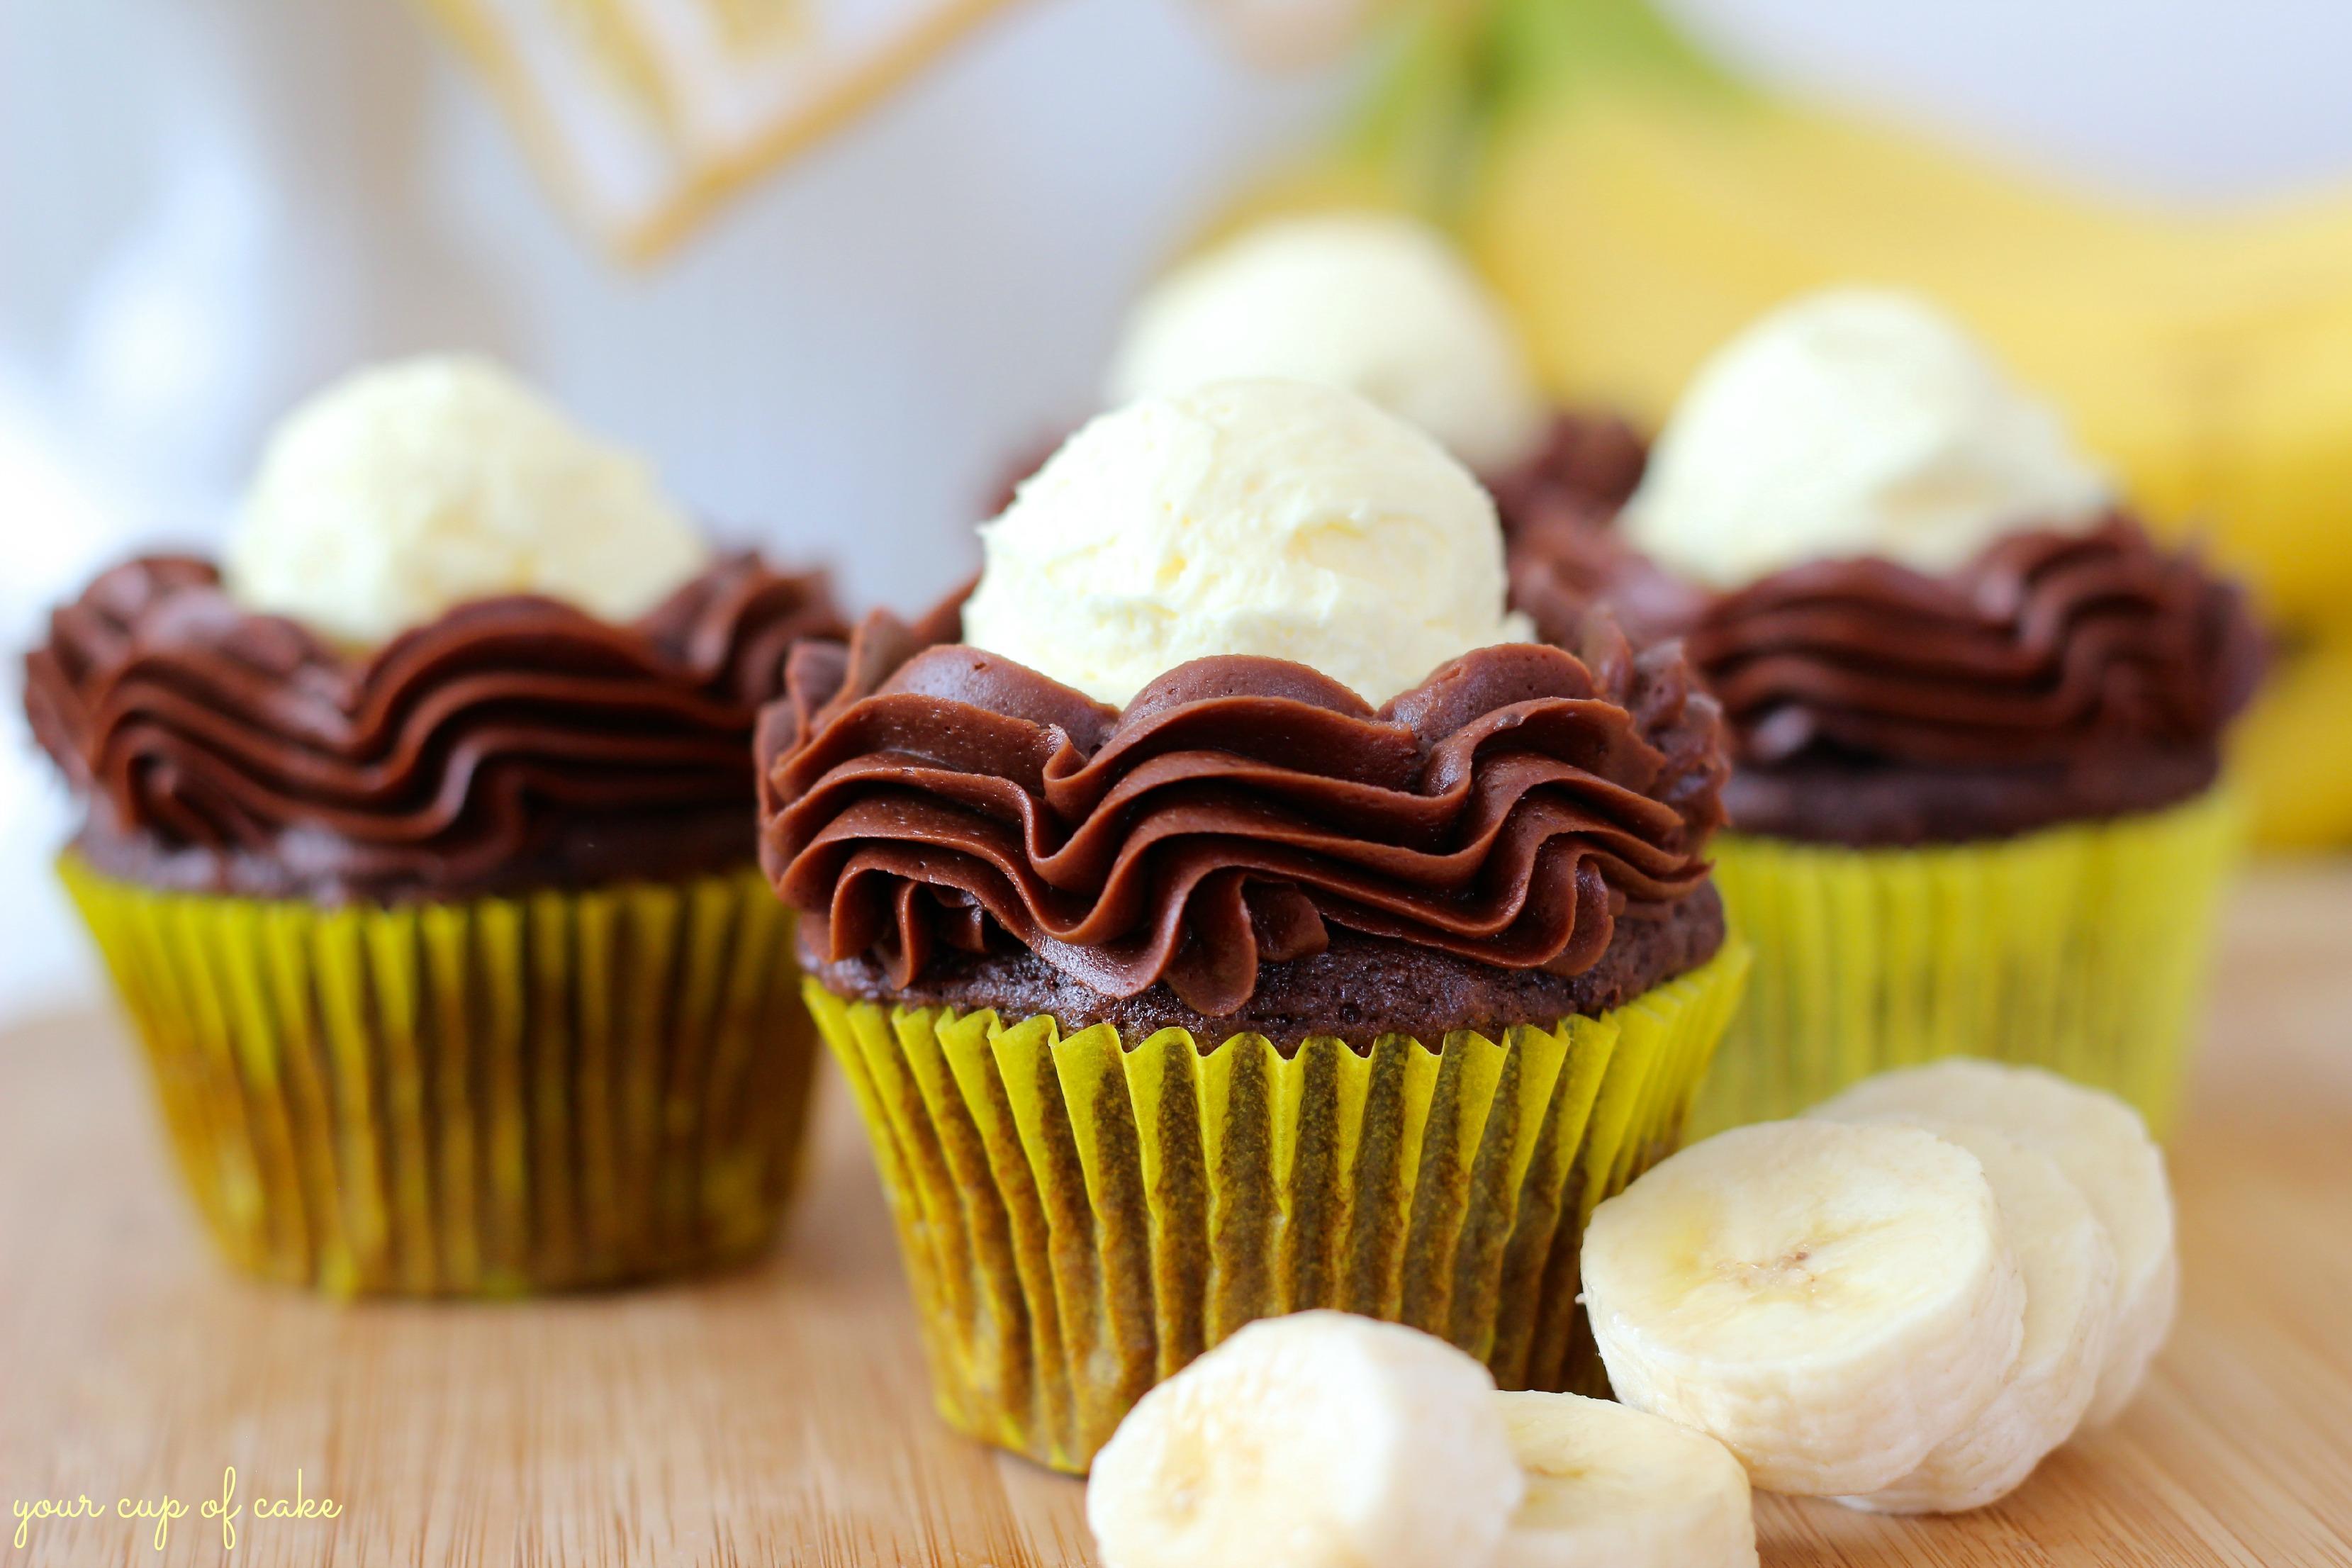 Compelling Chocolate Banana Cream Pie Cupcake Chocolate Banana Cream Pie Cupcakes Your Cup Cake Banana Cream Cake Recipe Paula Deen Banana Cream Cake Strain nice food Banana Cream Cake